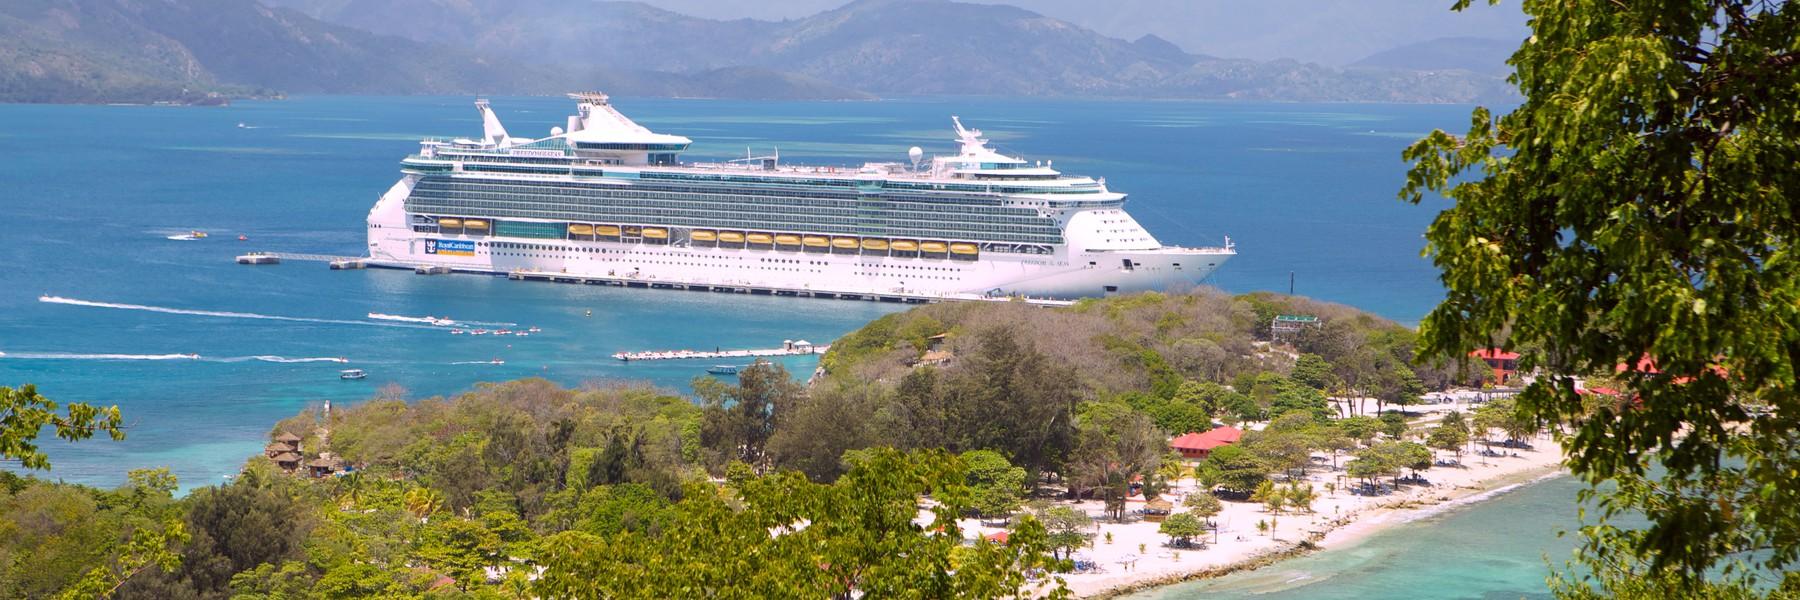 Freedom of the Seas Royal Caribbean